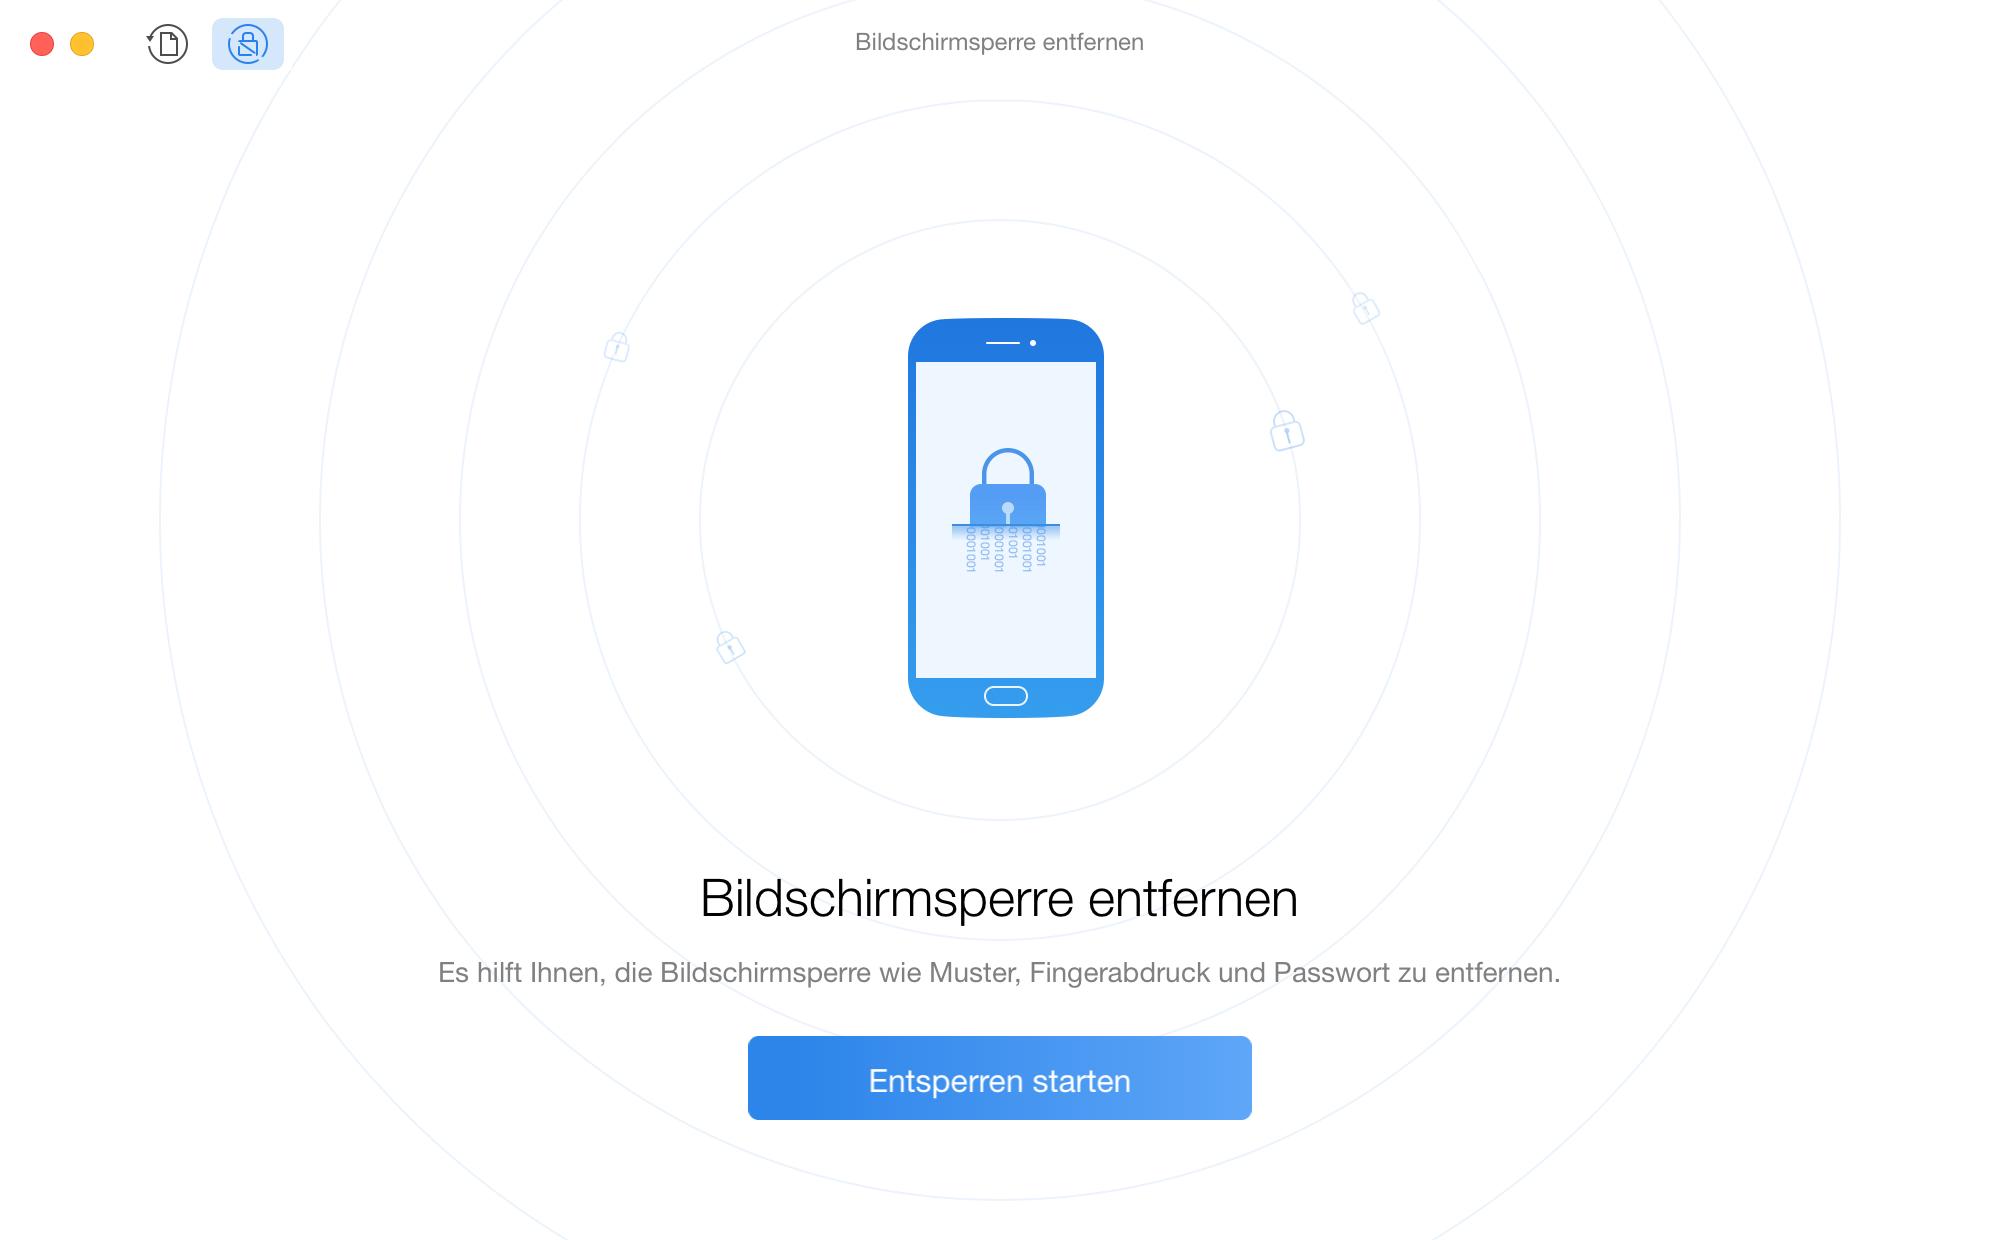 Android Passwort vergessen - Schritt 2